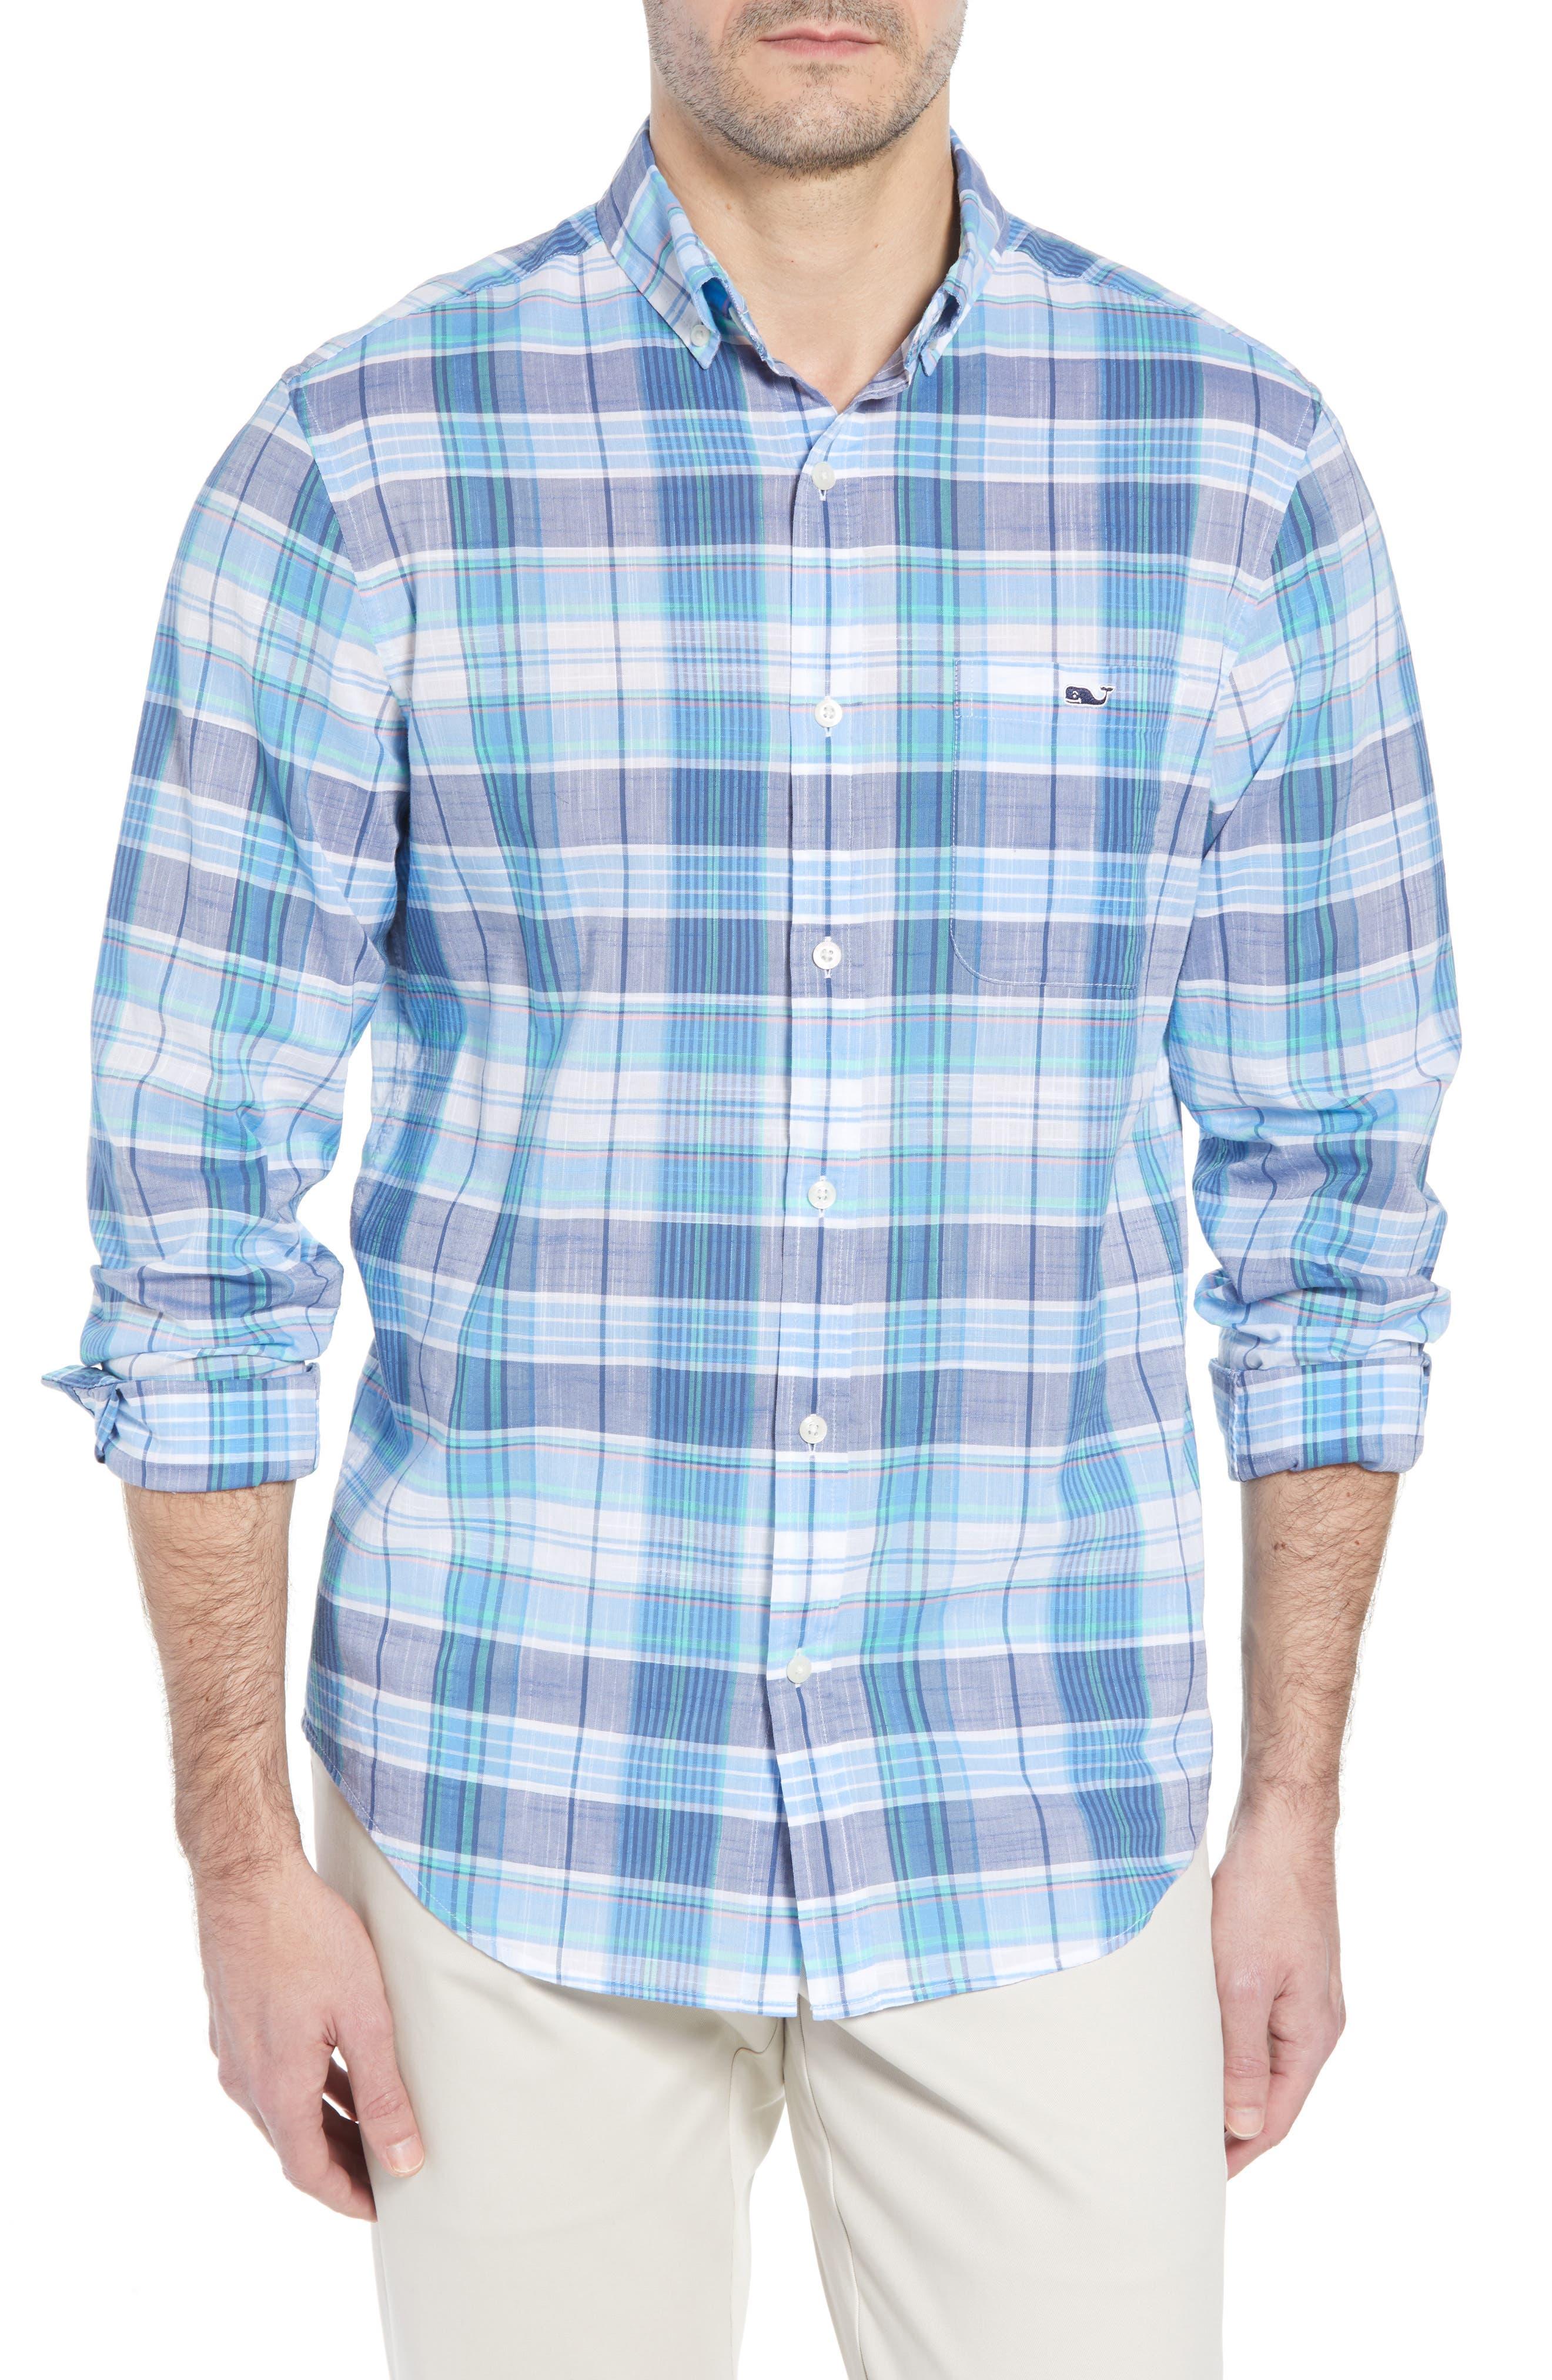 Smith Point Tucker Classic Fit Plaid Sport Shirt,                             Main thumbnail 1, color,                             Moonshine